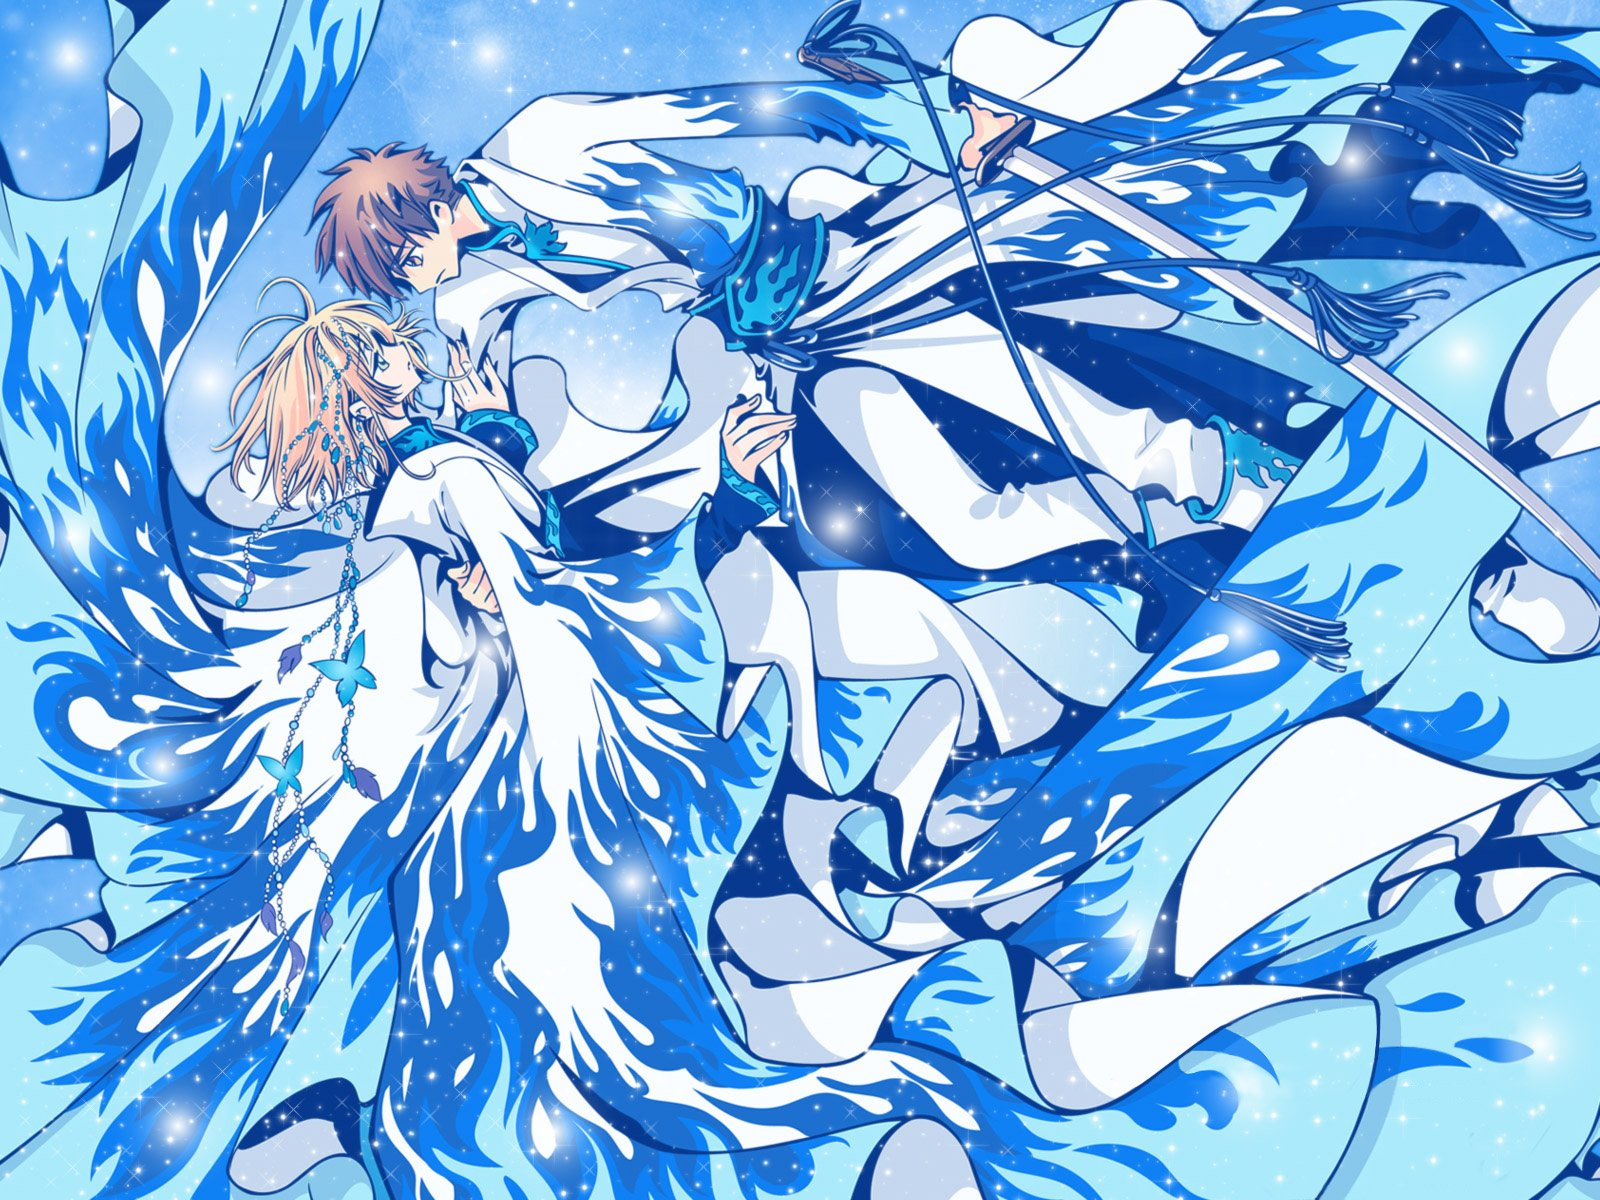 203 Tsubasa: Reservoir Chronicle Best Fantasy Anime You Need To Watch